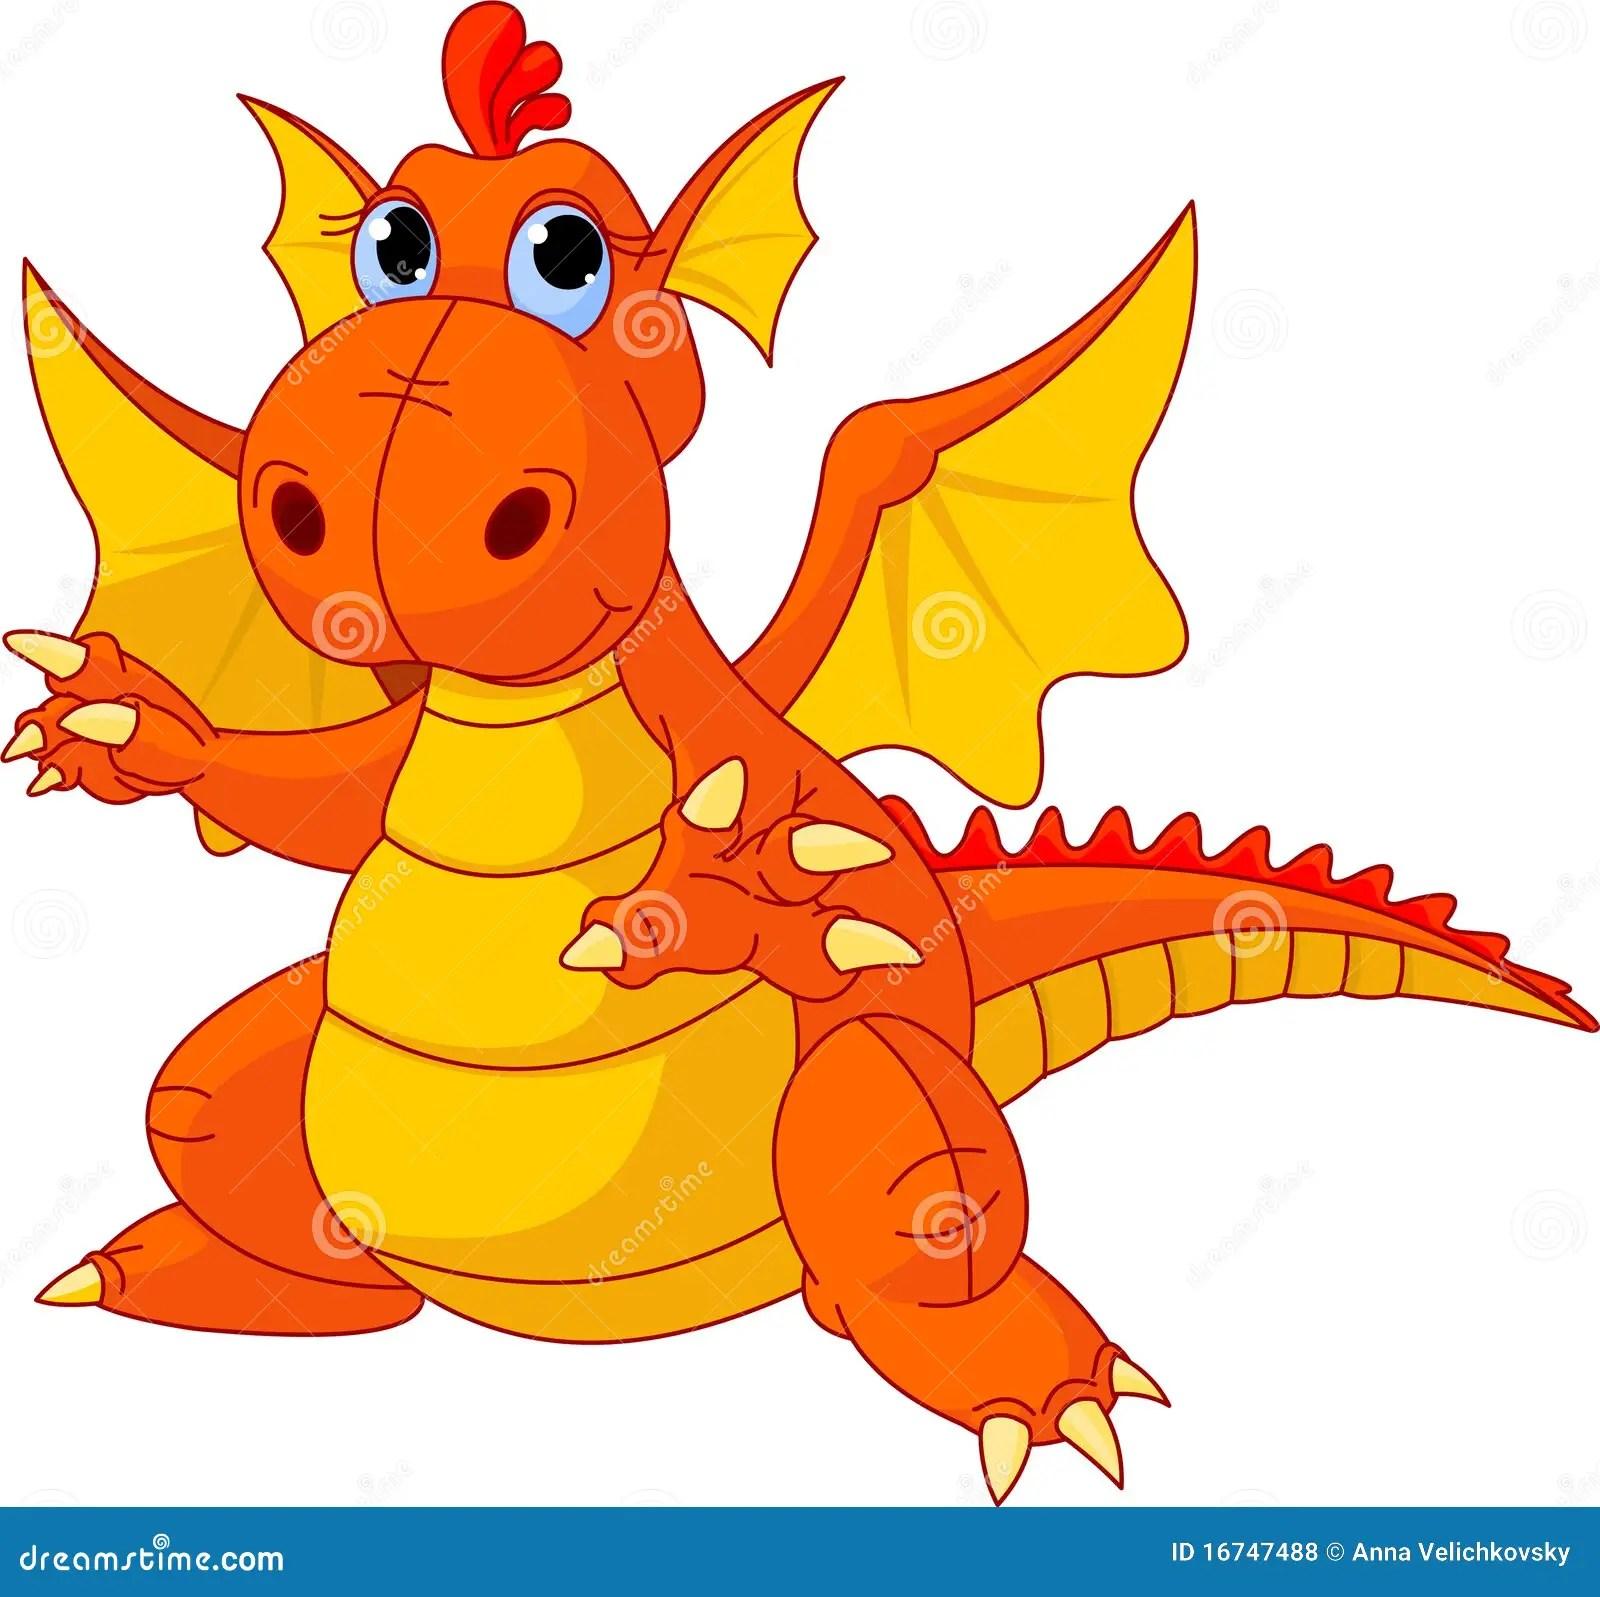 Cartoon Baby Dragon Royalty Free Stock Photos